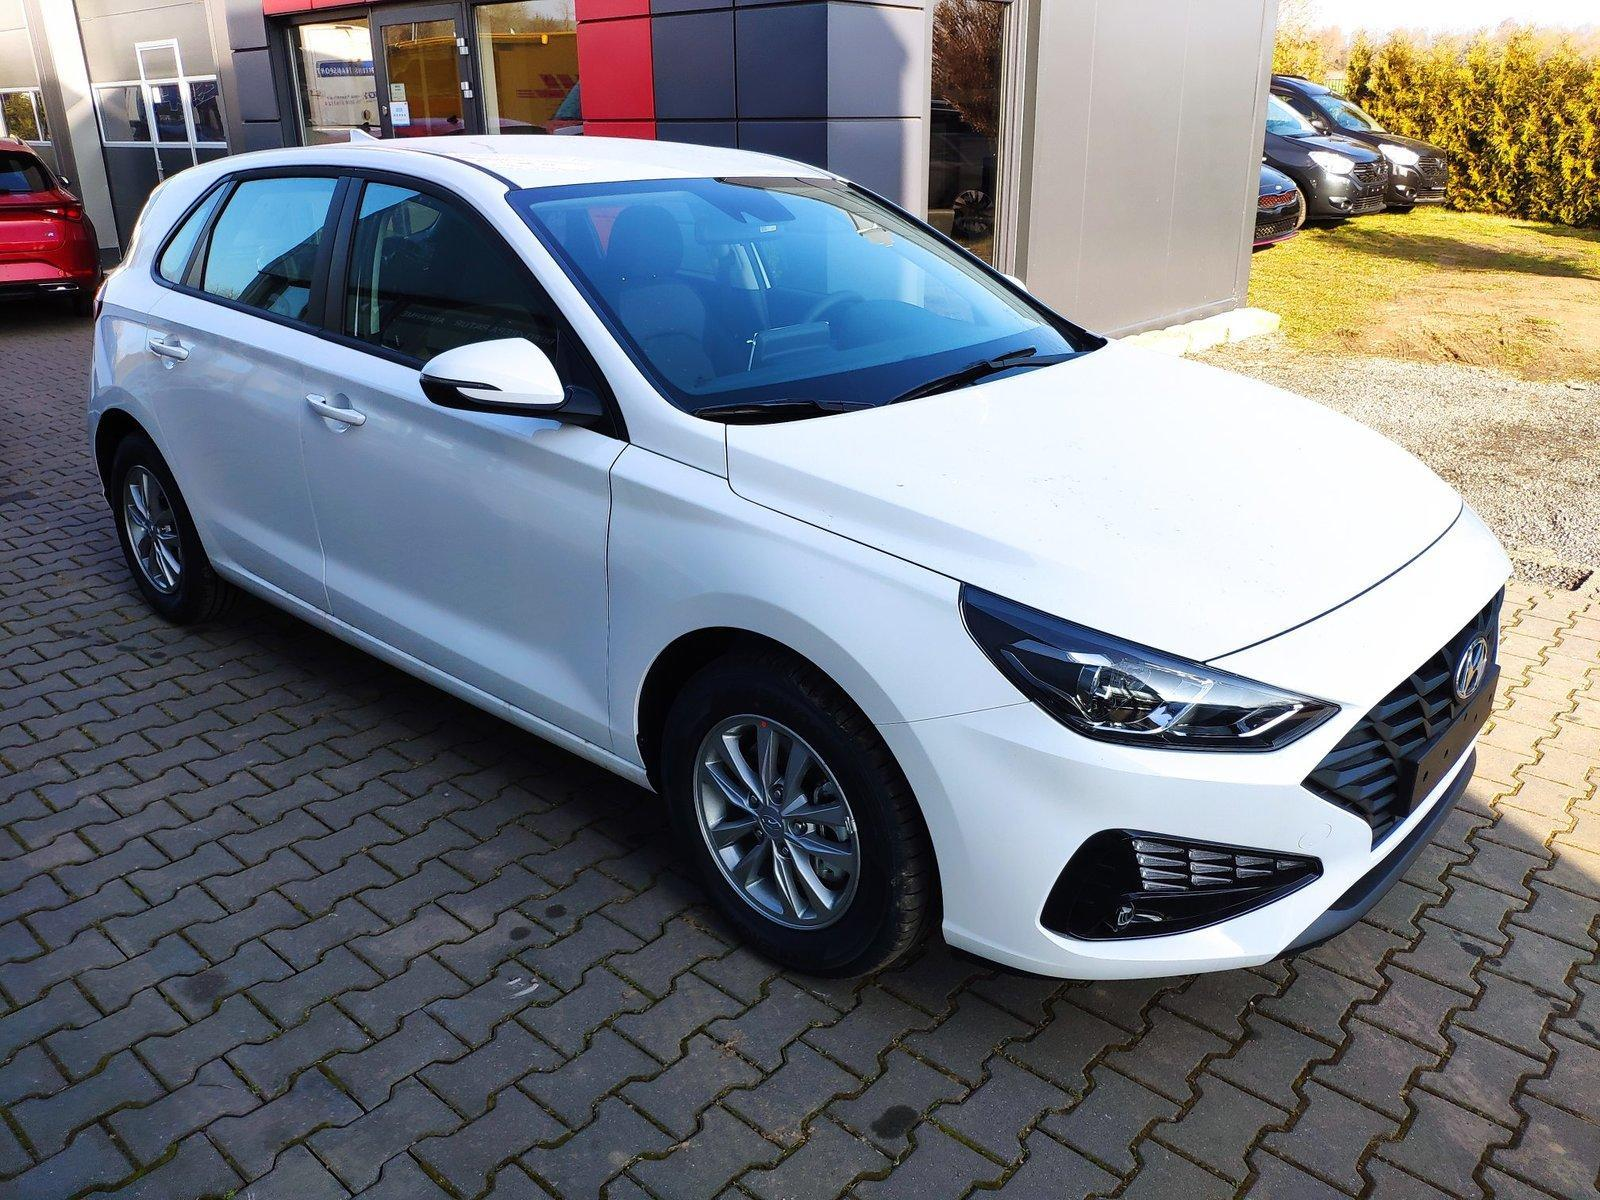 Hyundai i30 Neues Modell! App-Connect*Kamera*Klima uvm!